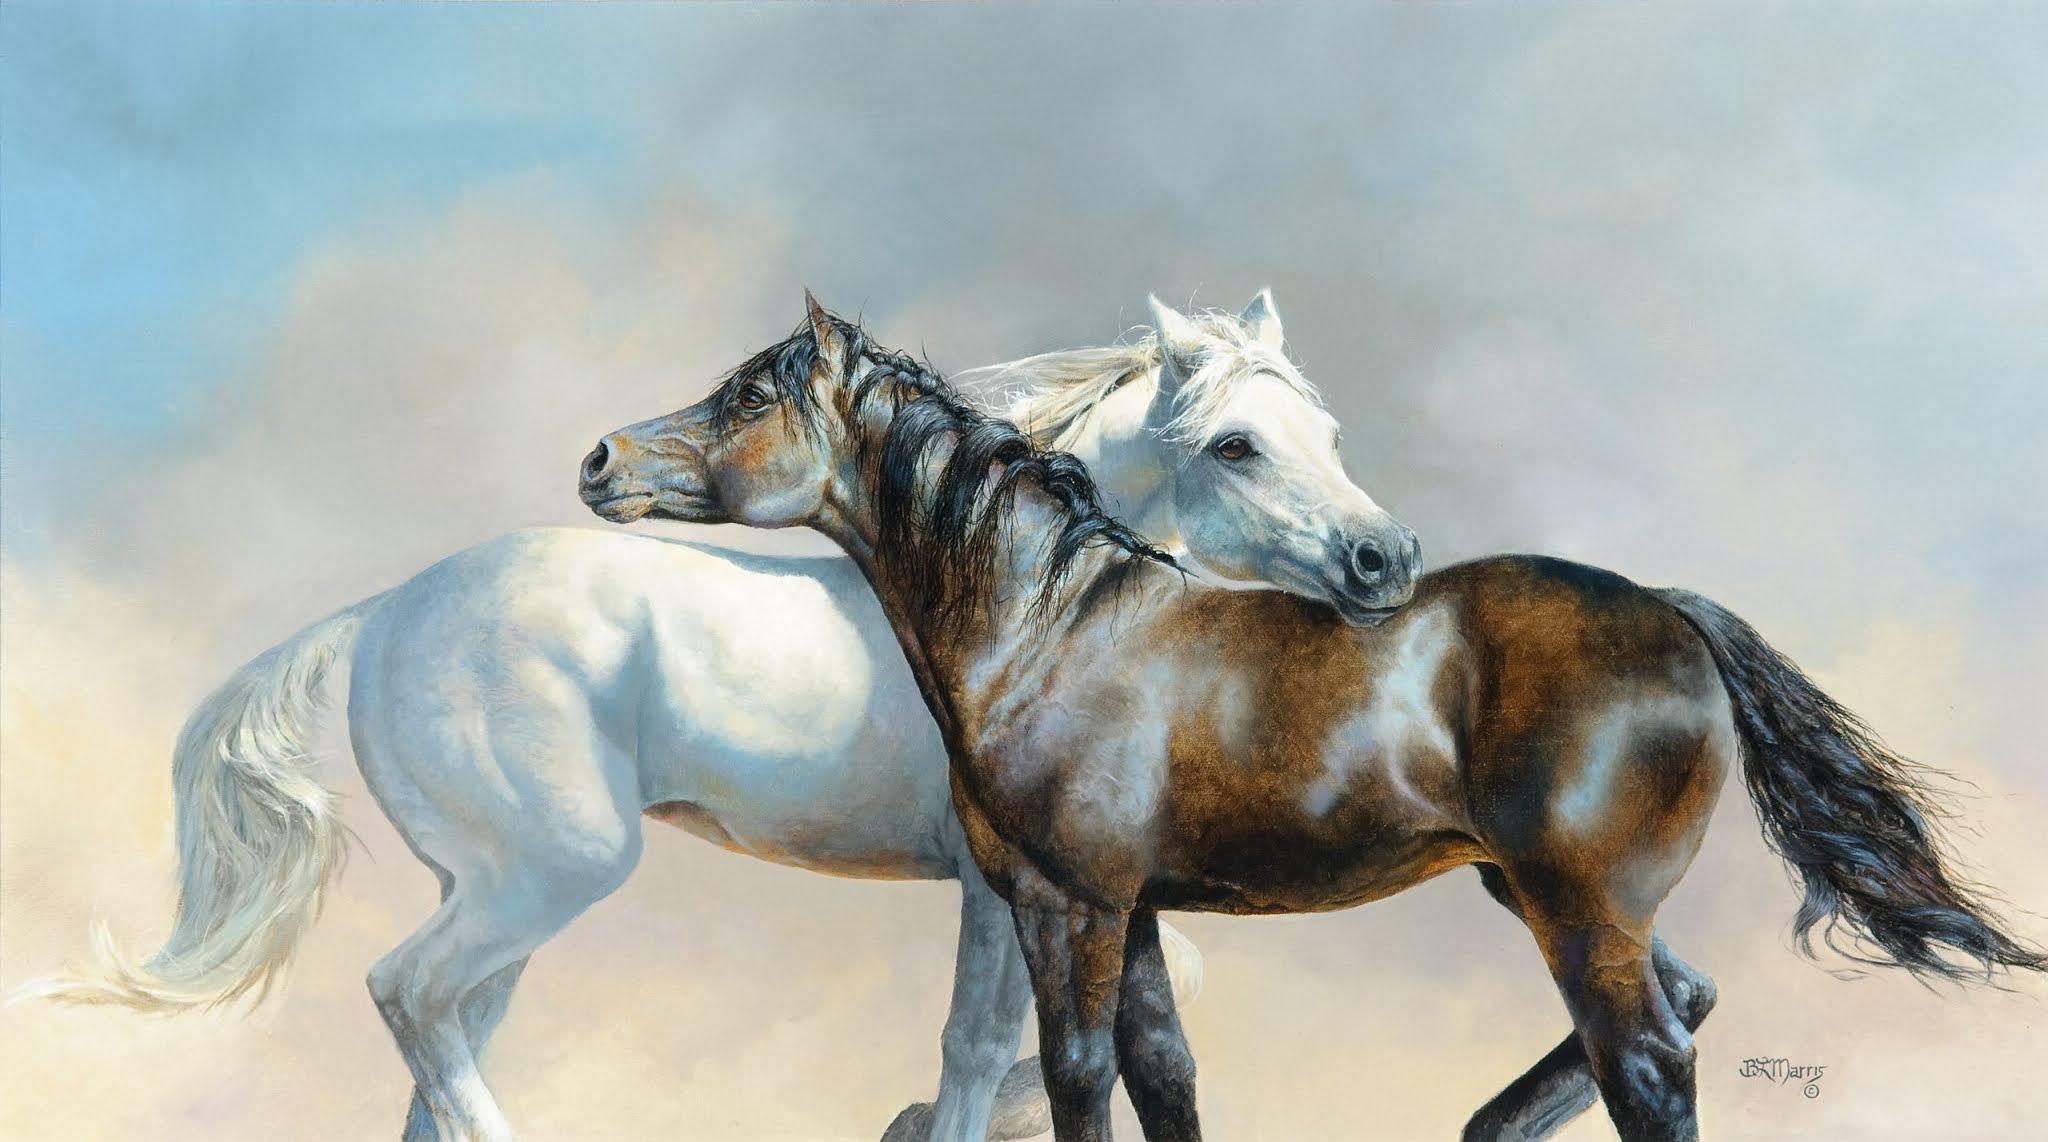 خلفيات حصان